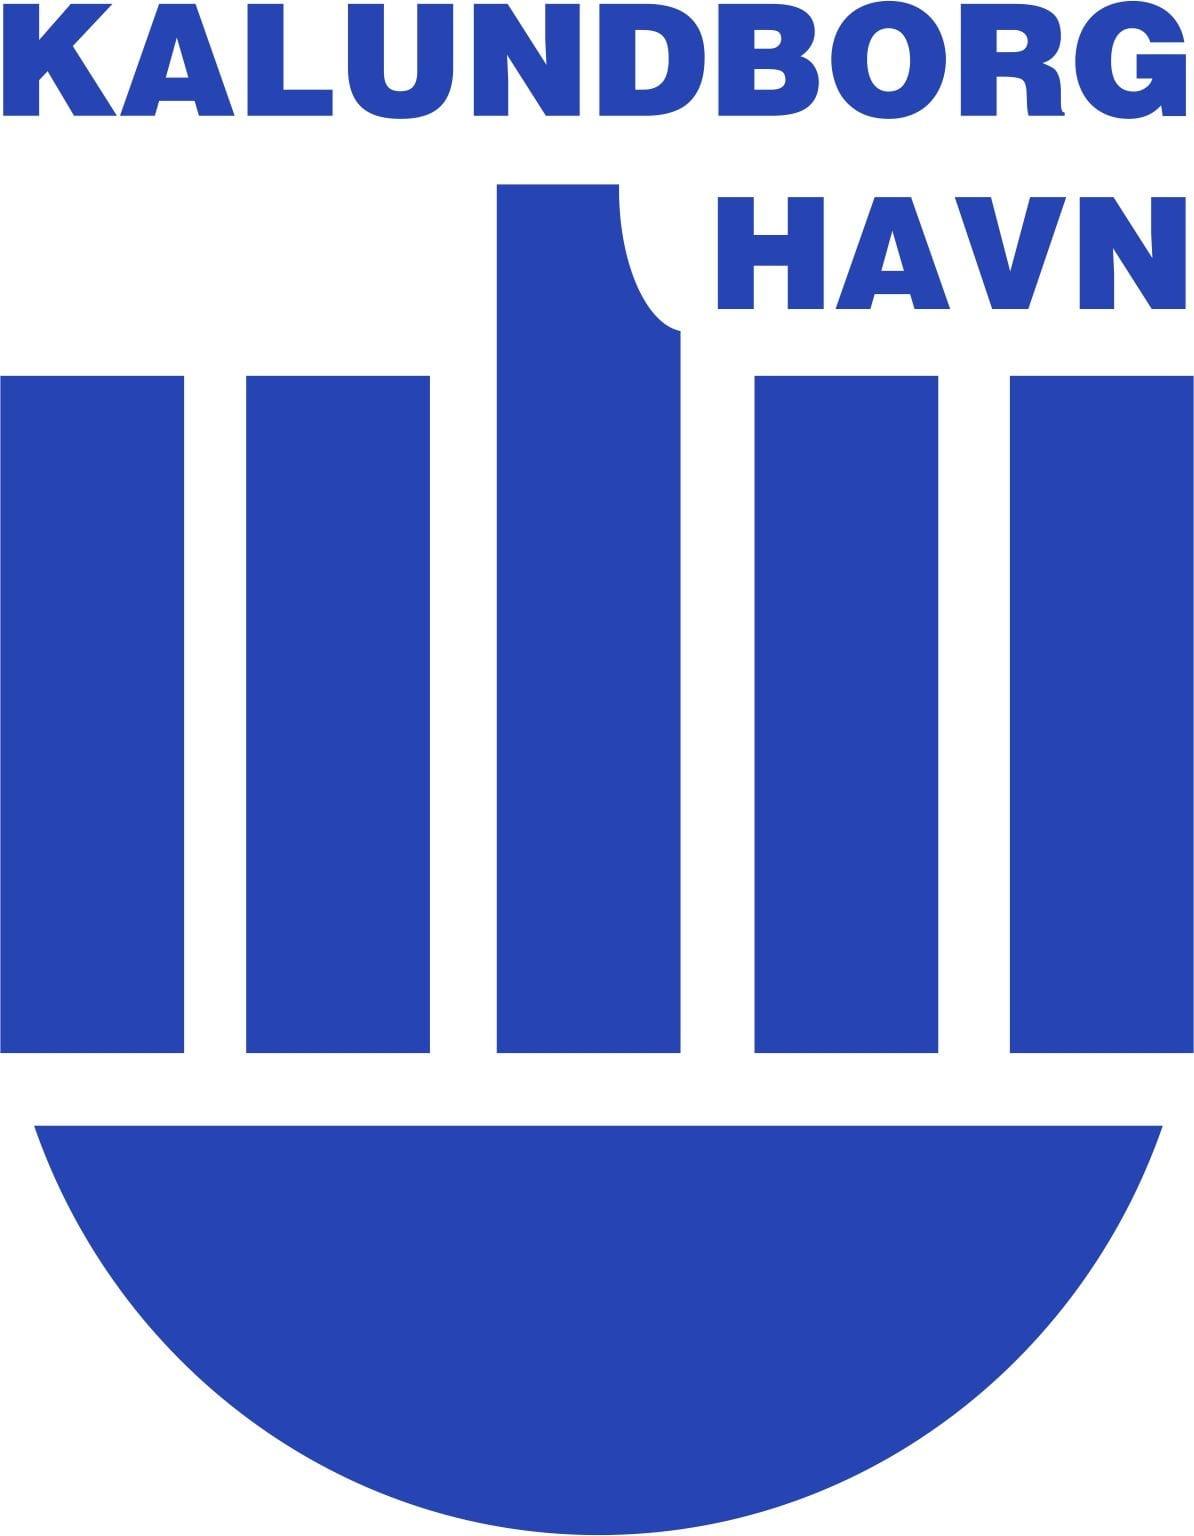 Kalundborg Havn logo